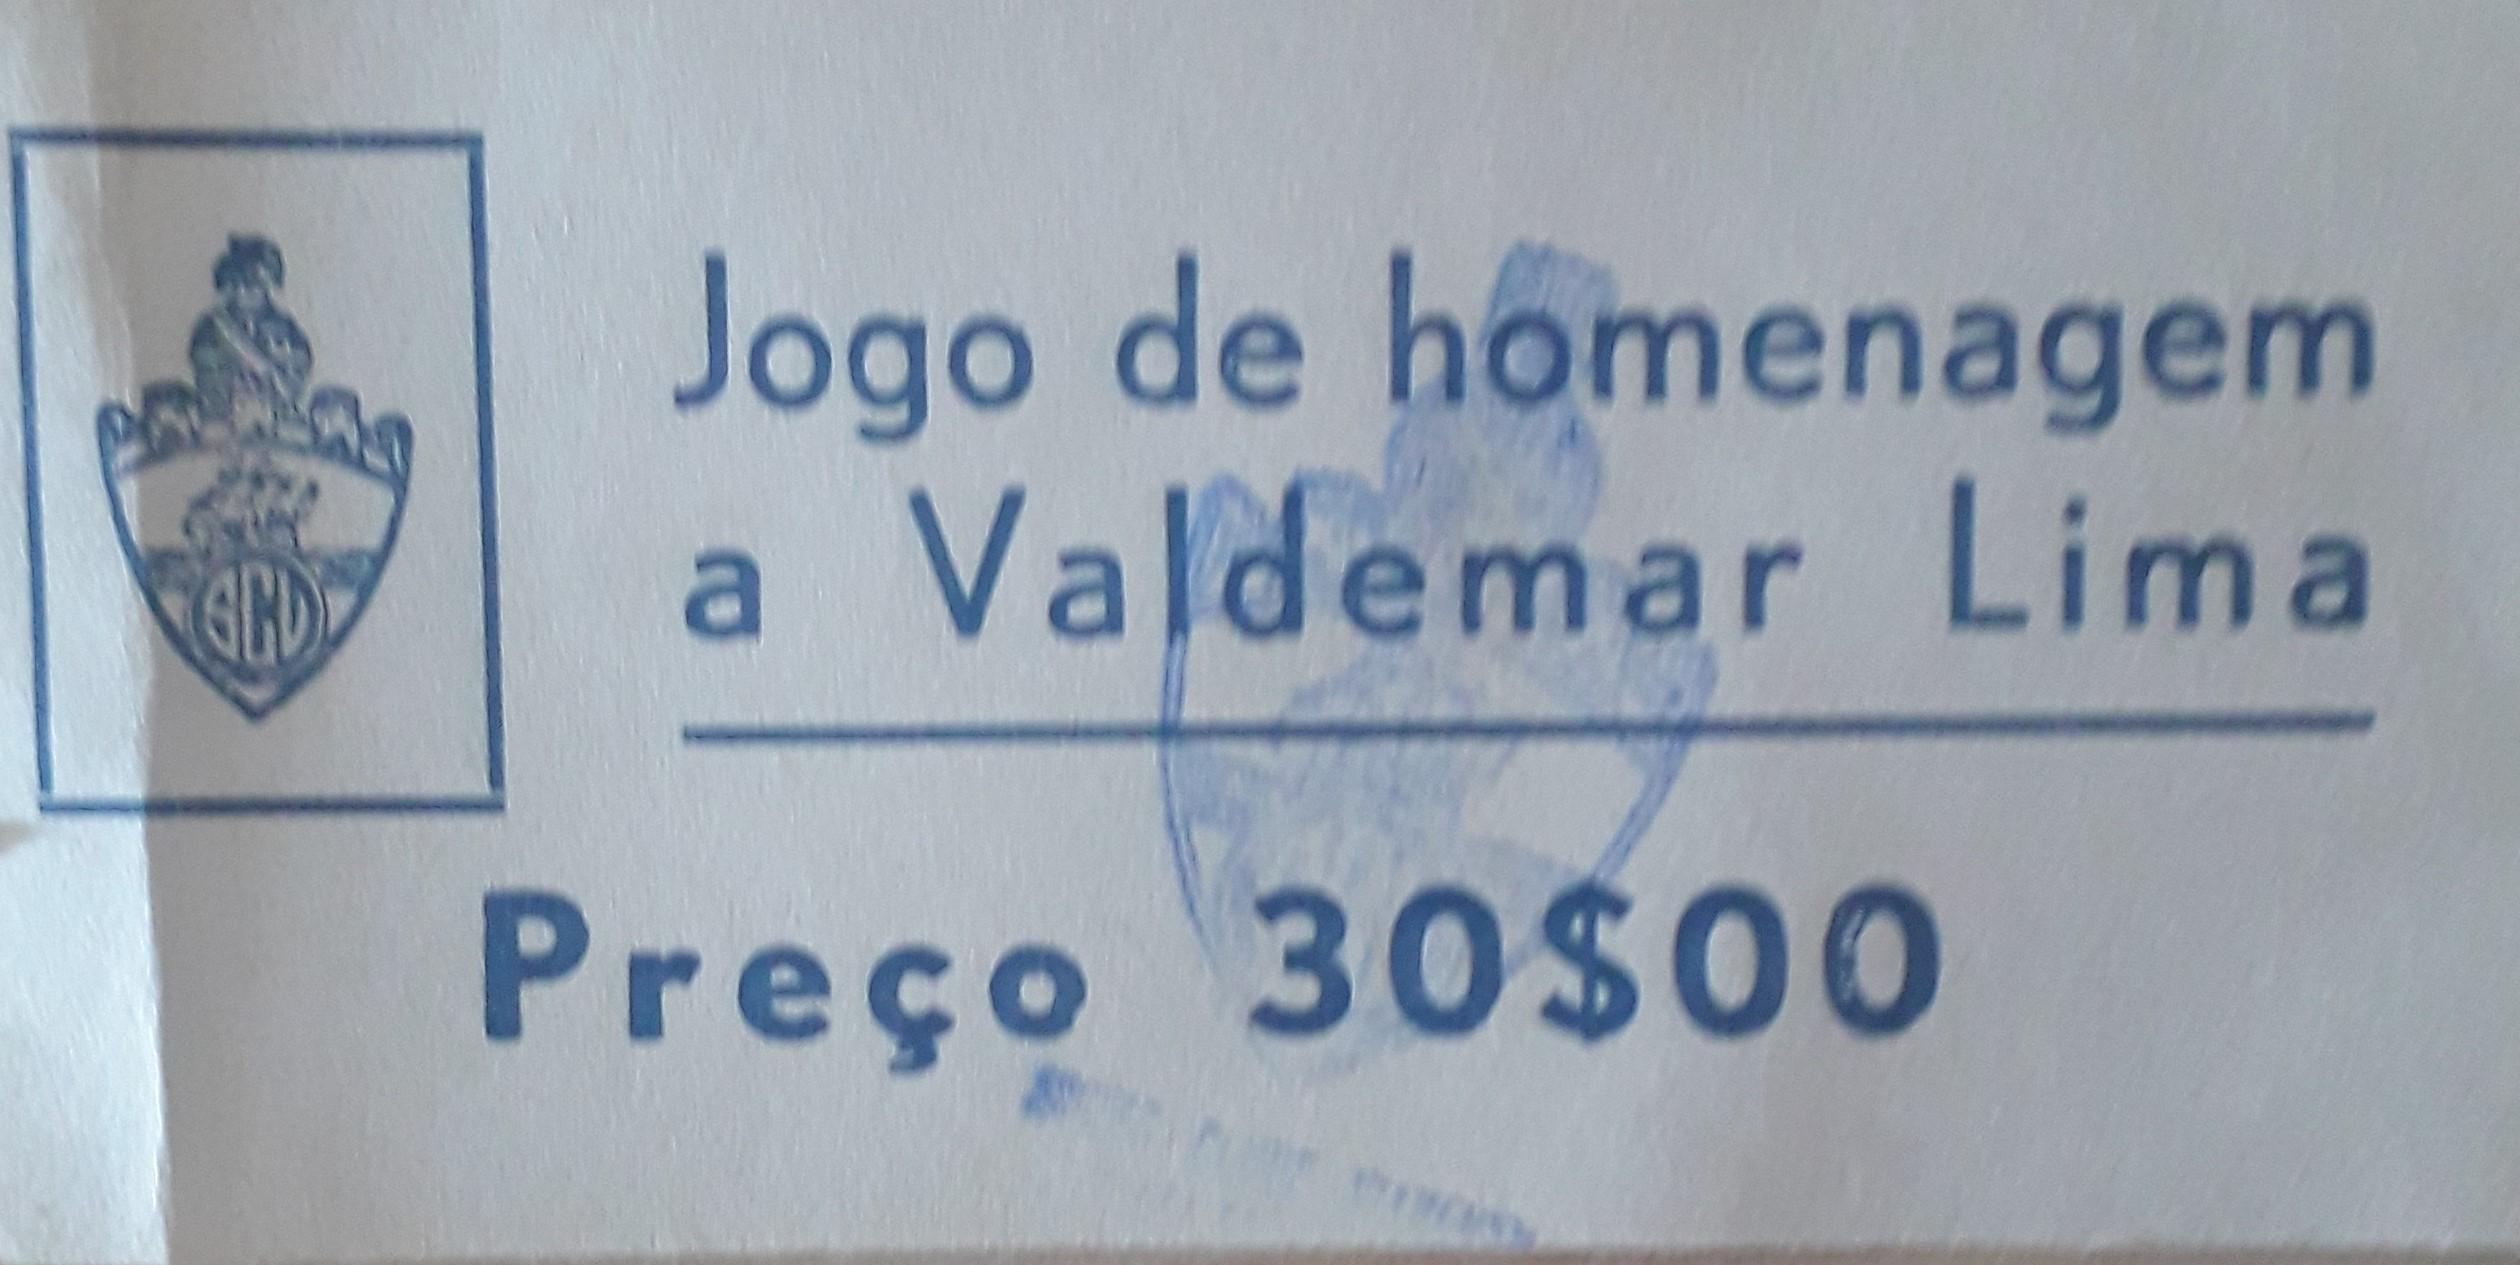 Valdemar Lima